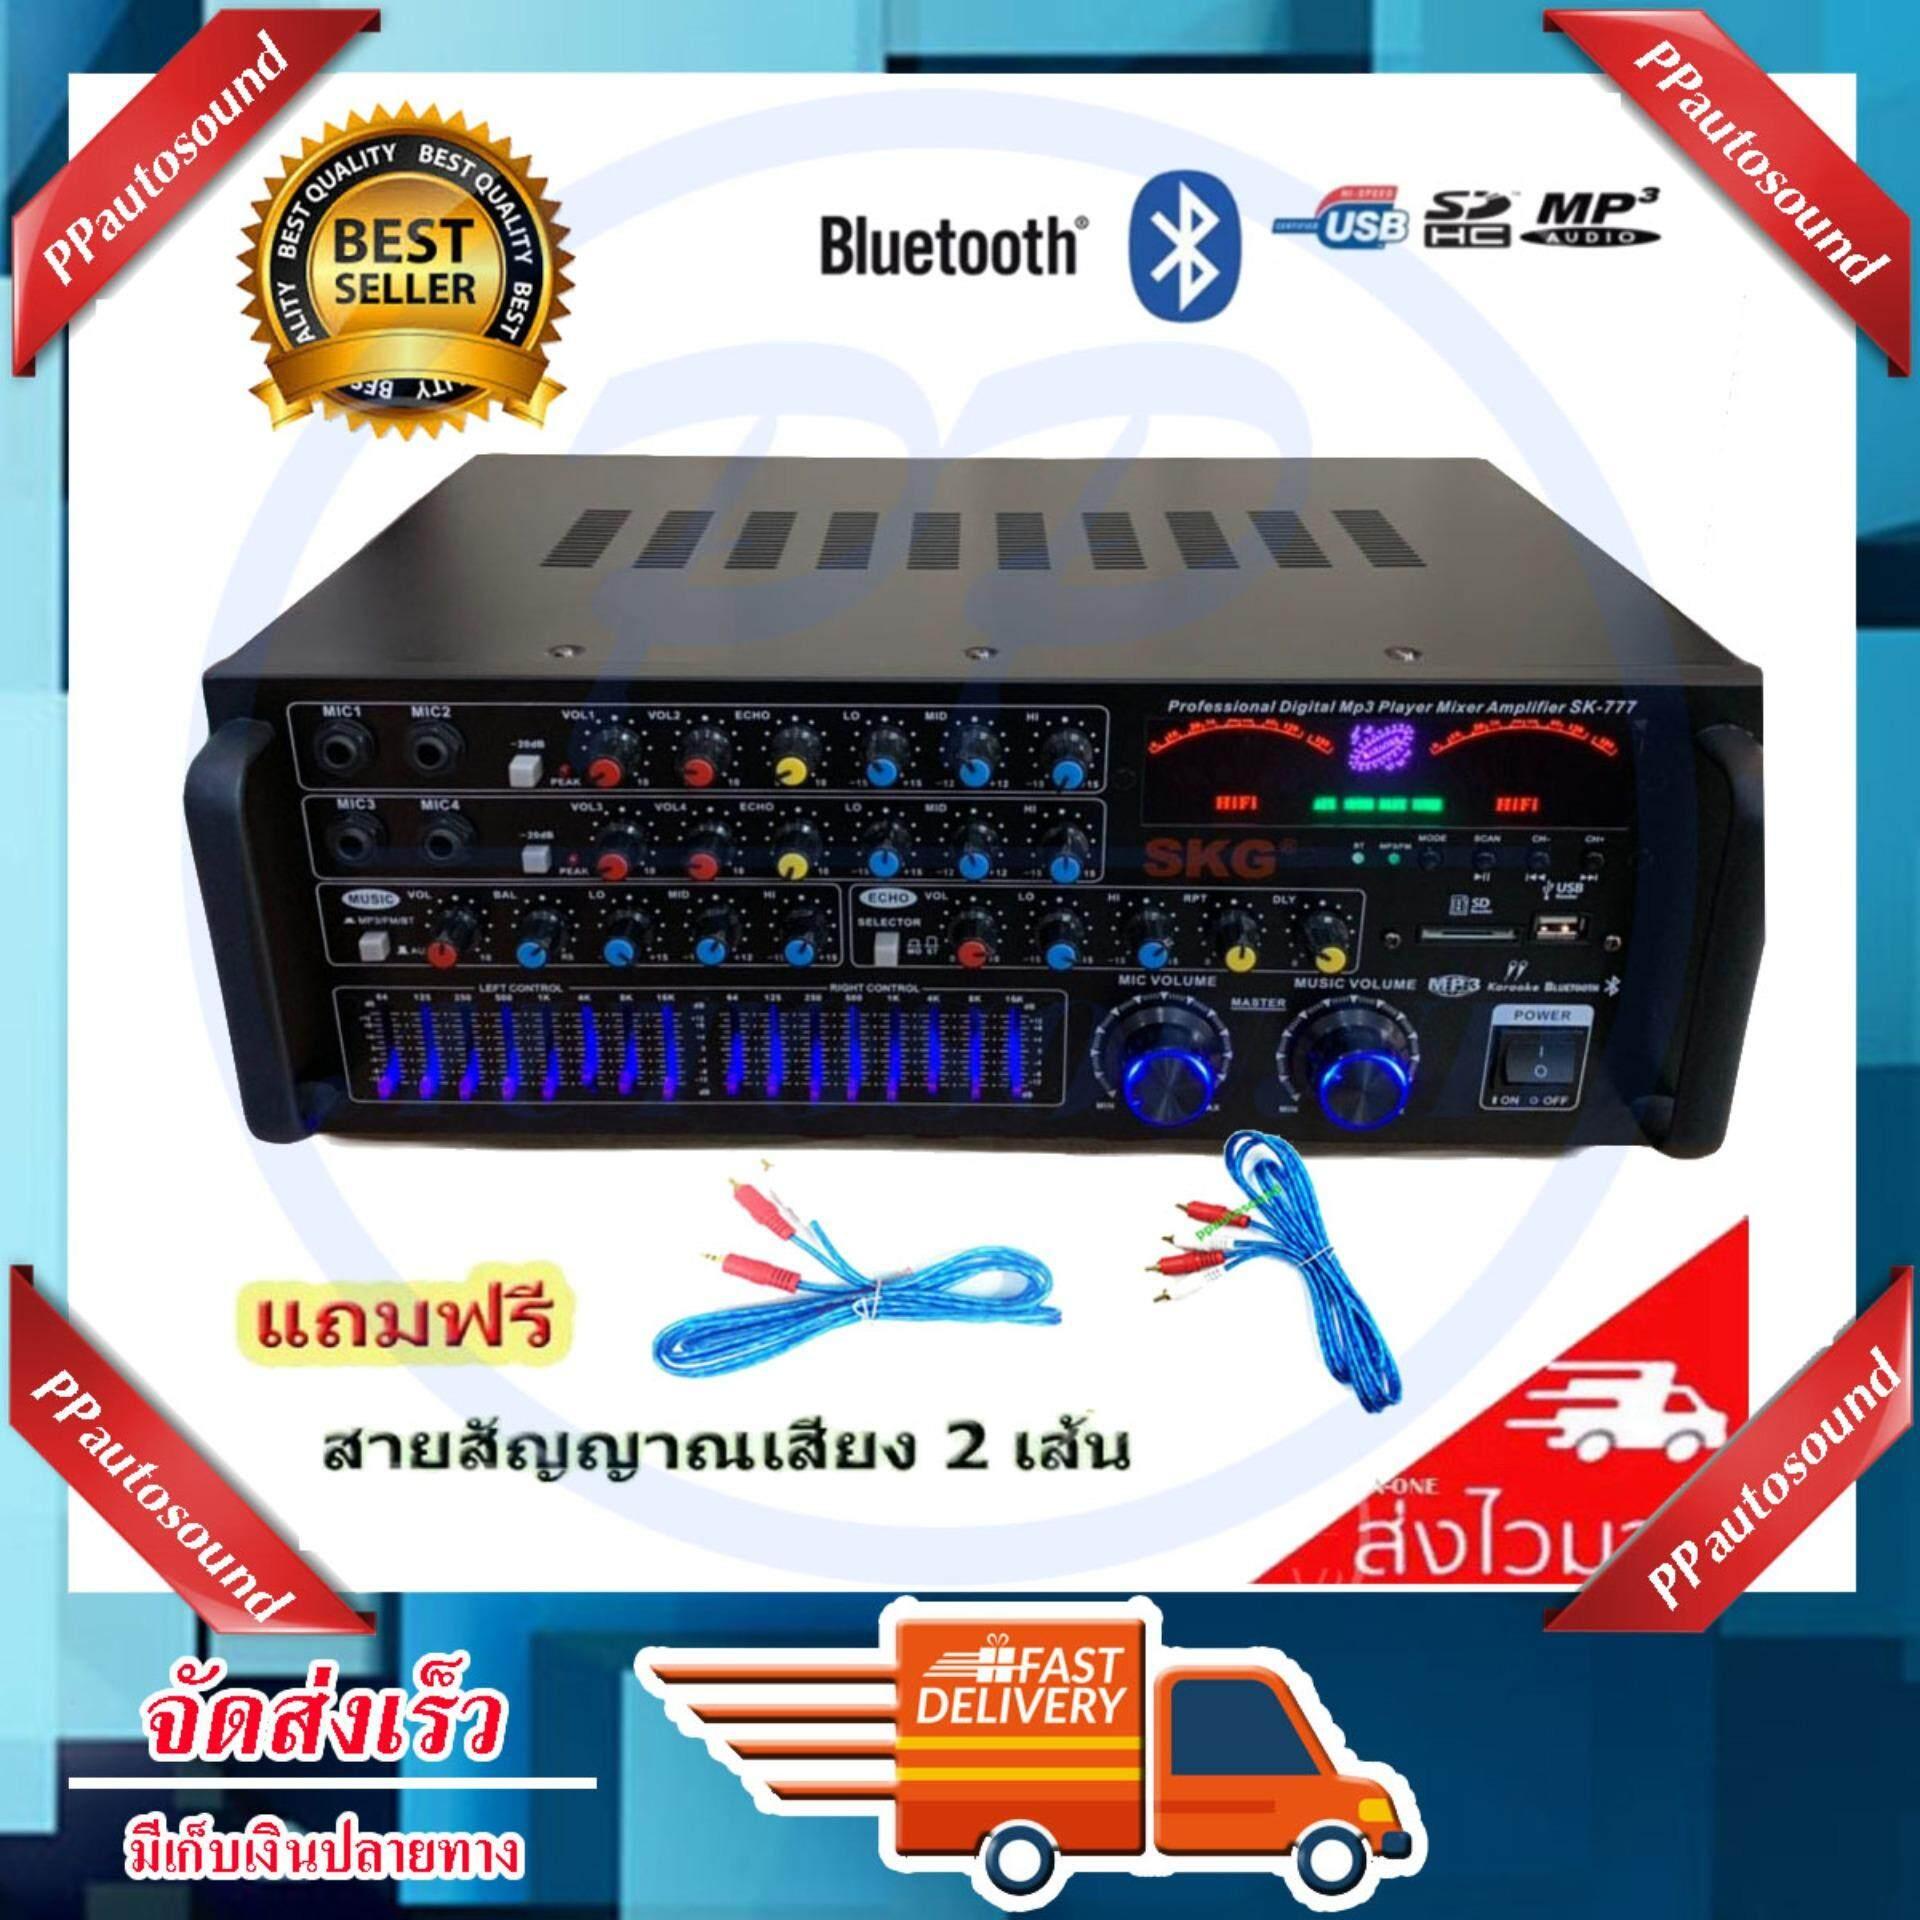 SKG เครื่องแอมป์ขยาย  Bluetooth USB 5000w P.M.P.O รุ่น SK-777